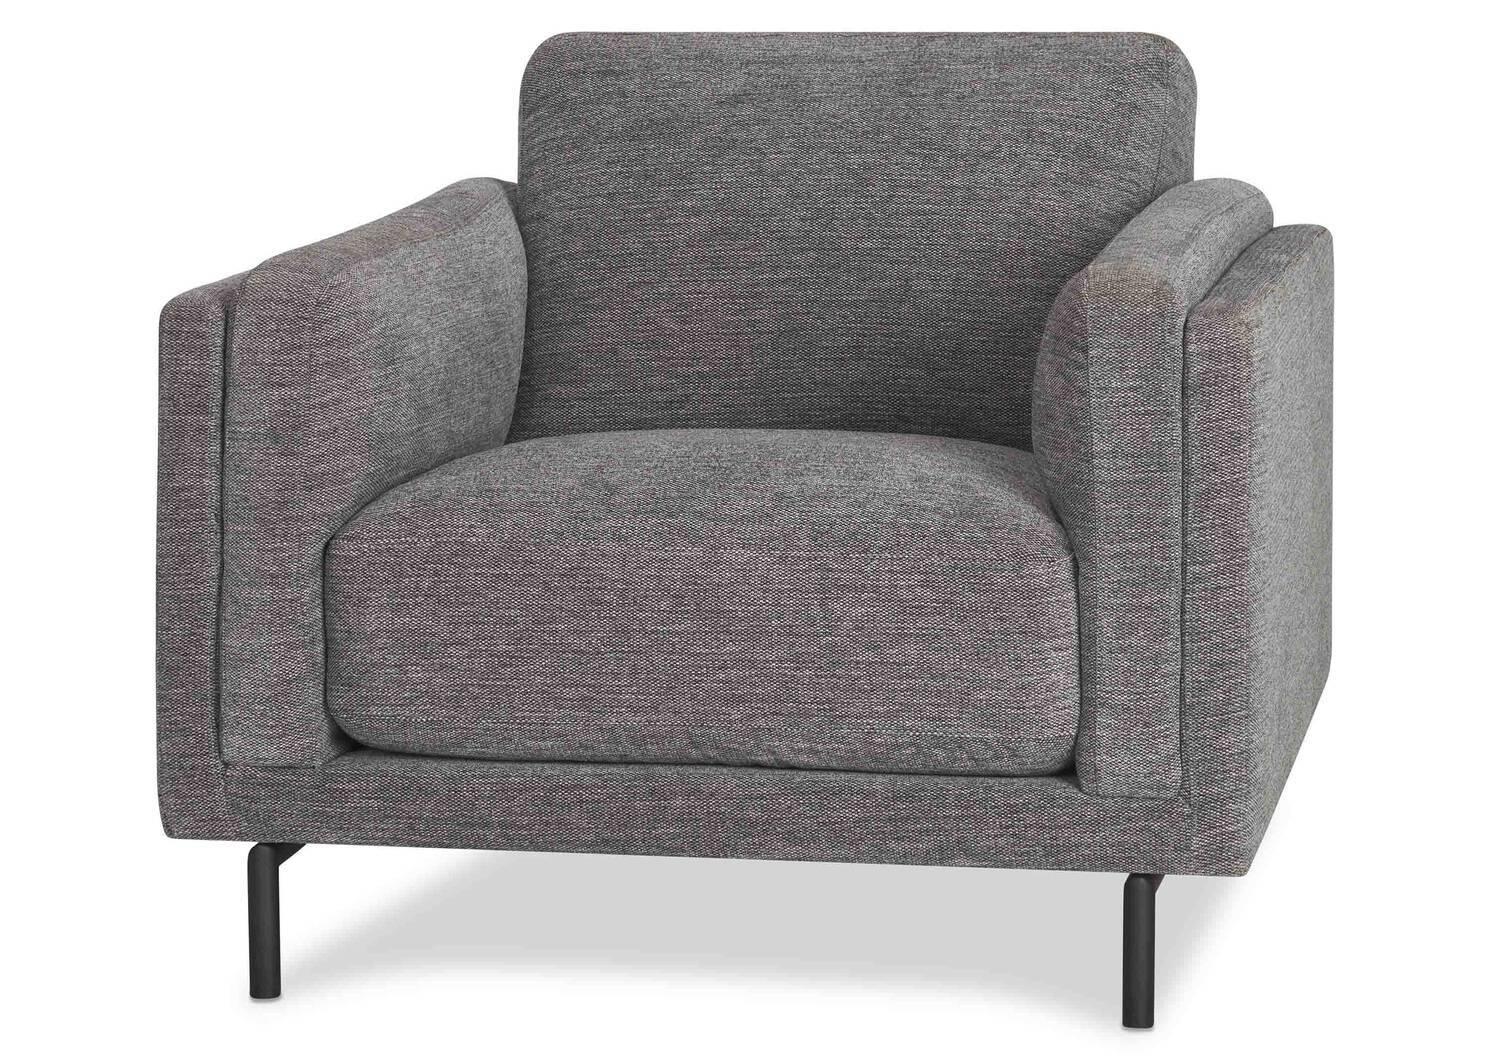 Fauteuil Renfrew -Jennings gris